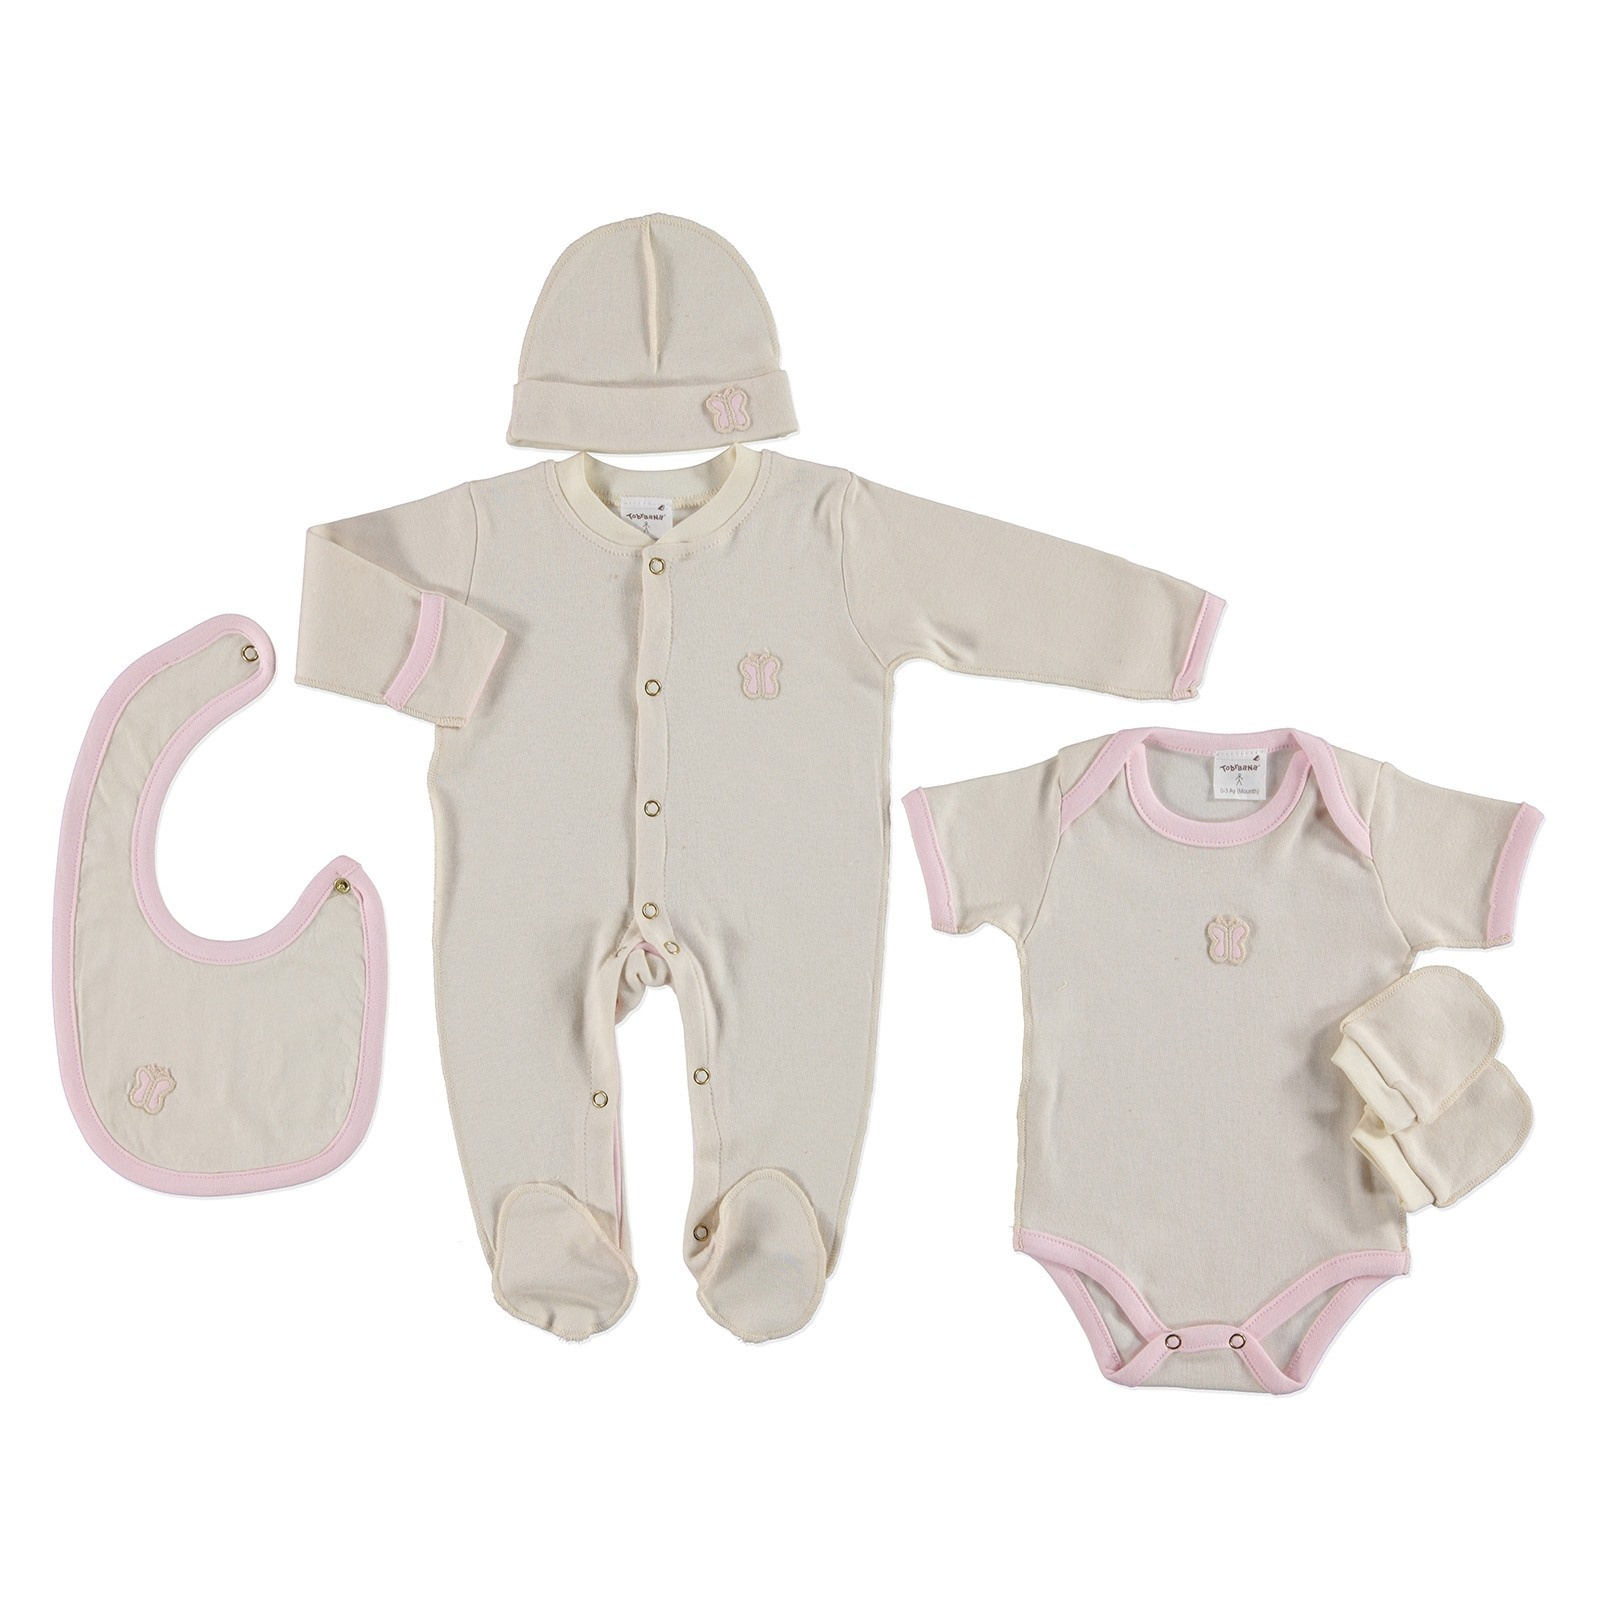 Ebebek TobraAna Newborn Baby Nev Series Organic Long Sleeve Footed Hospital Pack 5 Pcs